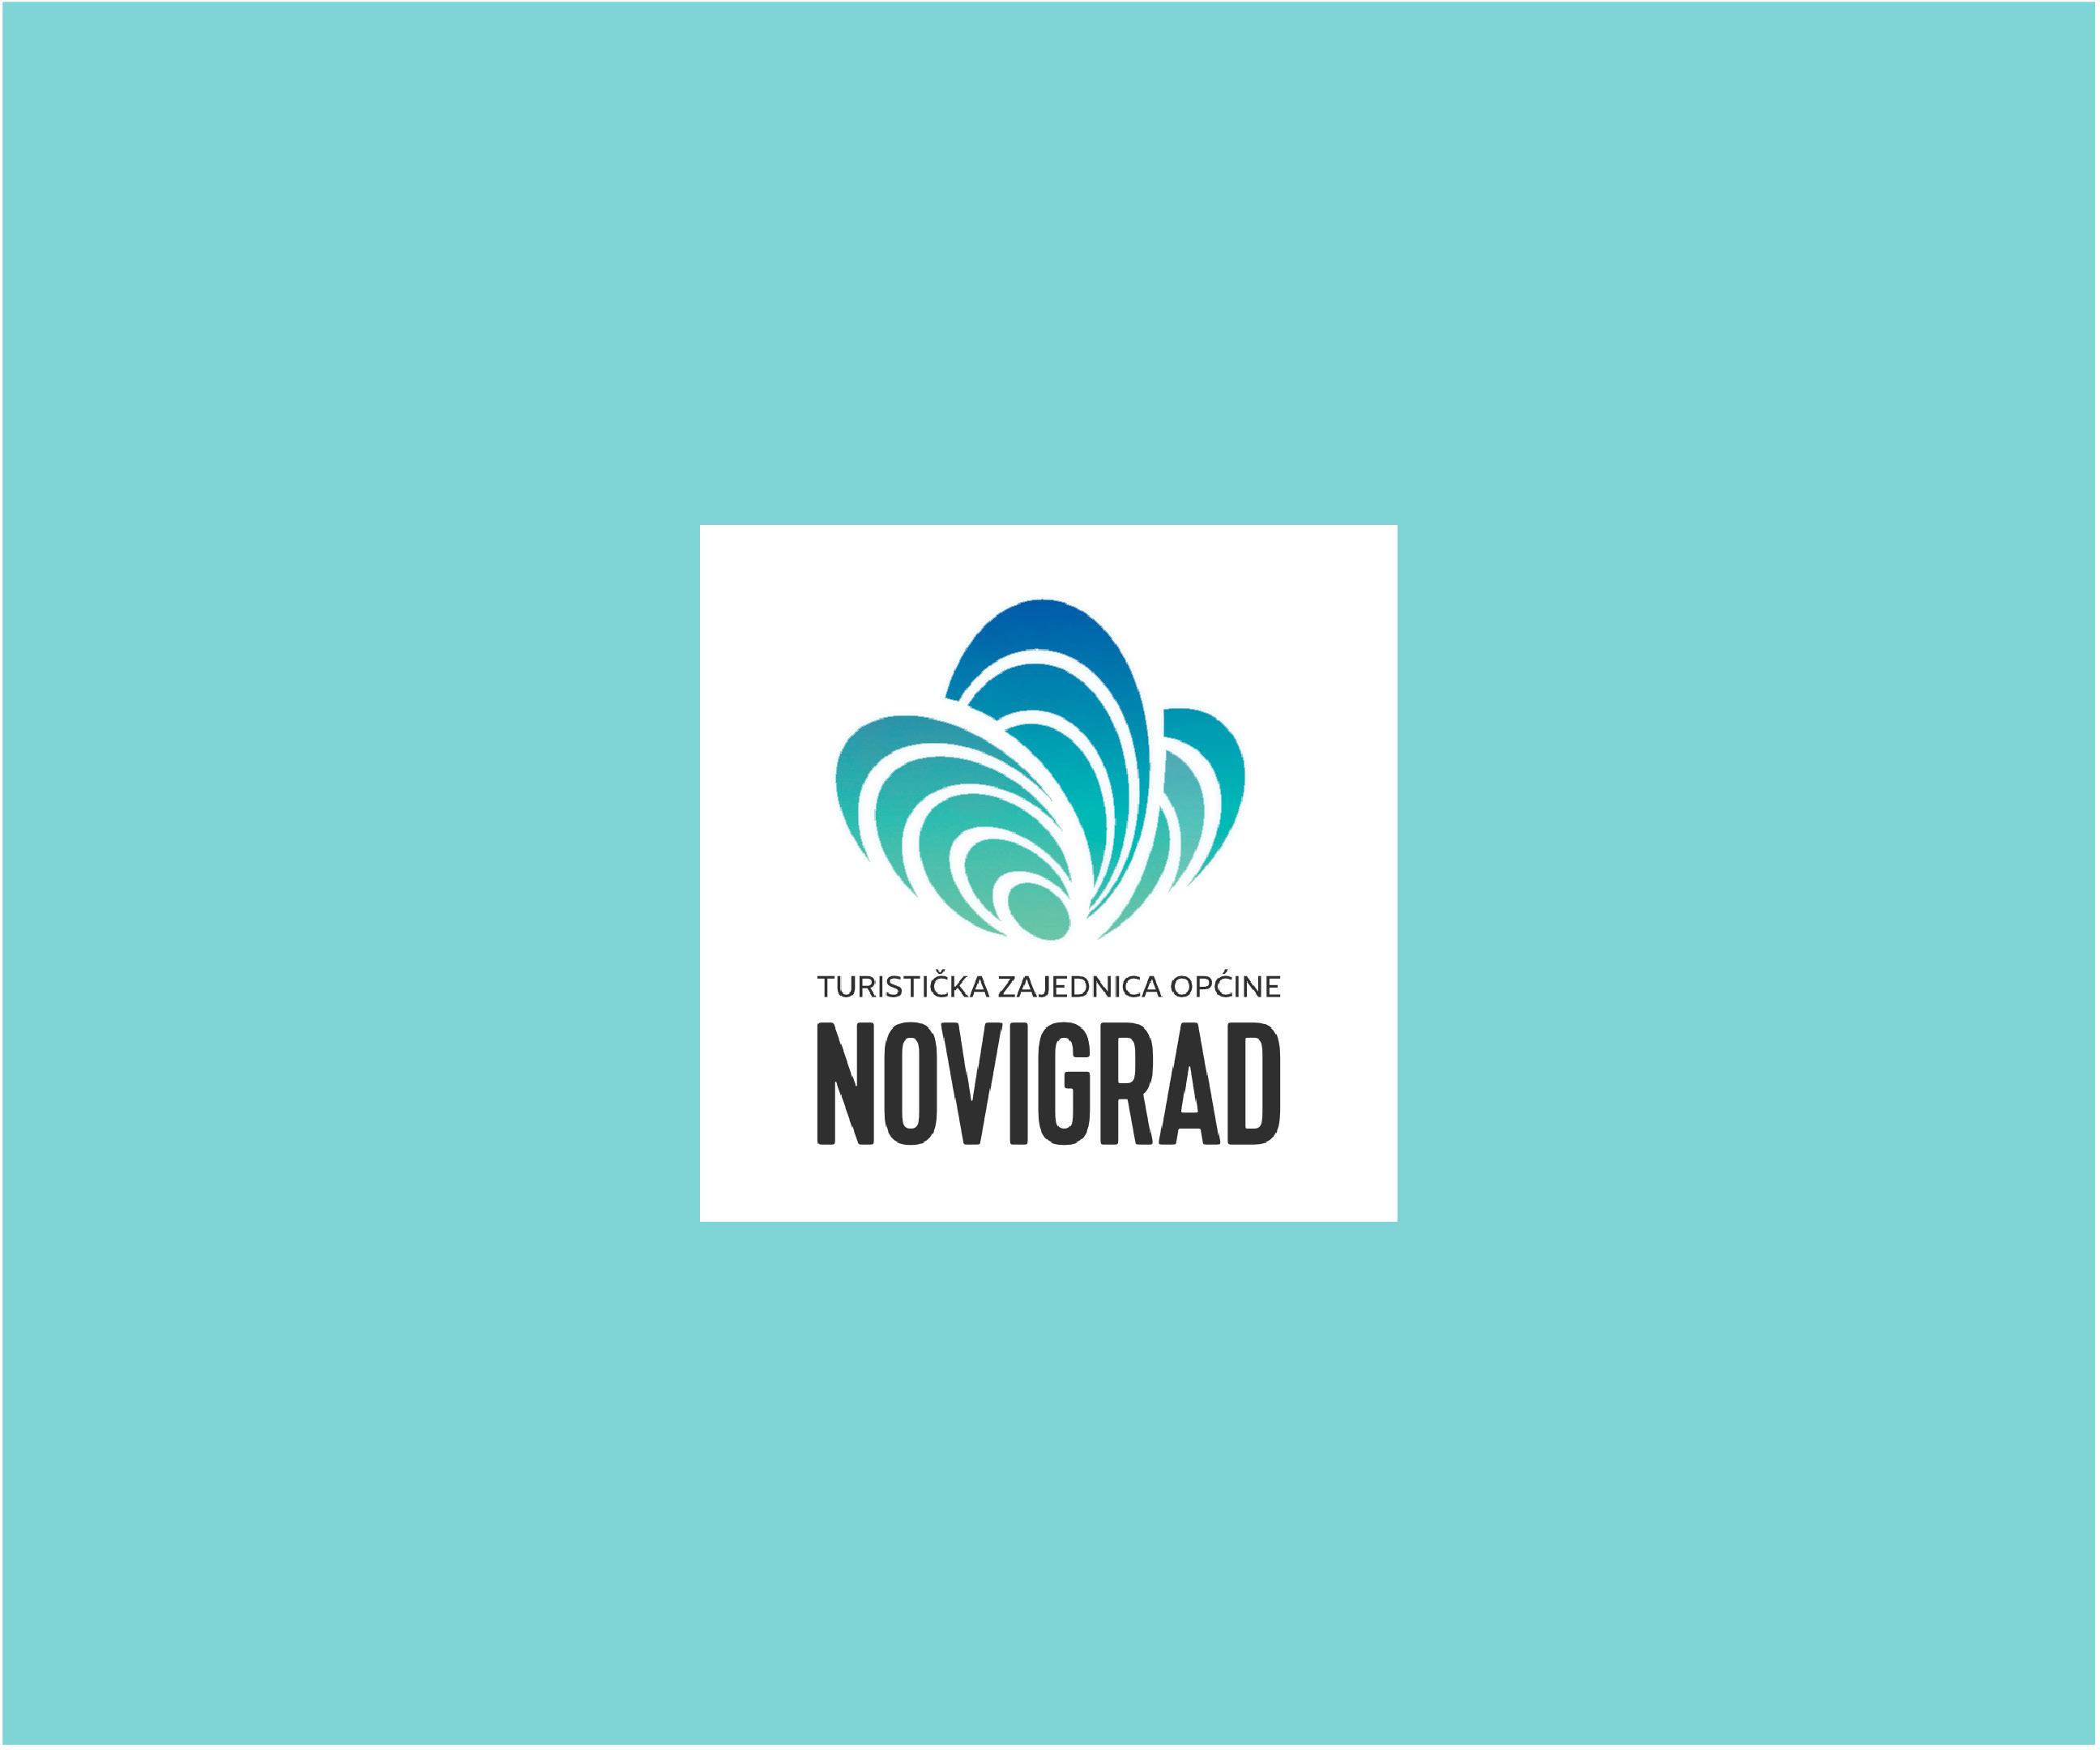 Visit Novigrad -  Travel to Croatia in 2021: The Secret to a Safe Getaway Lies in Pridraga